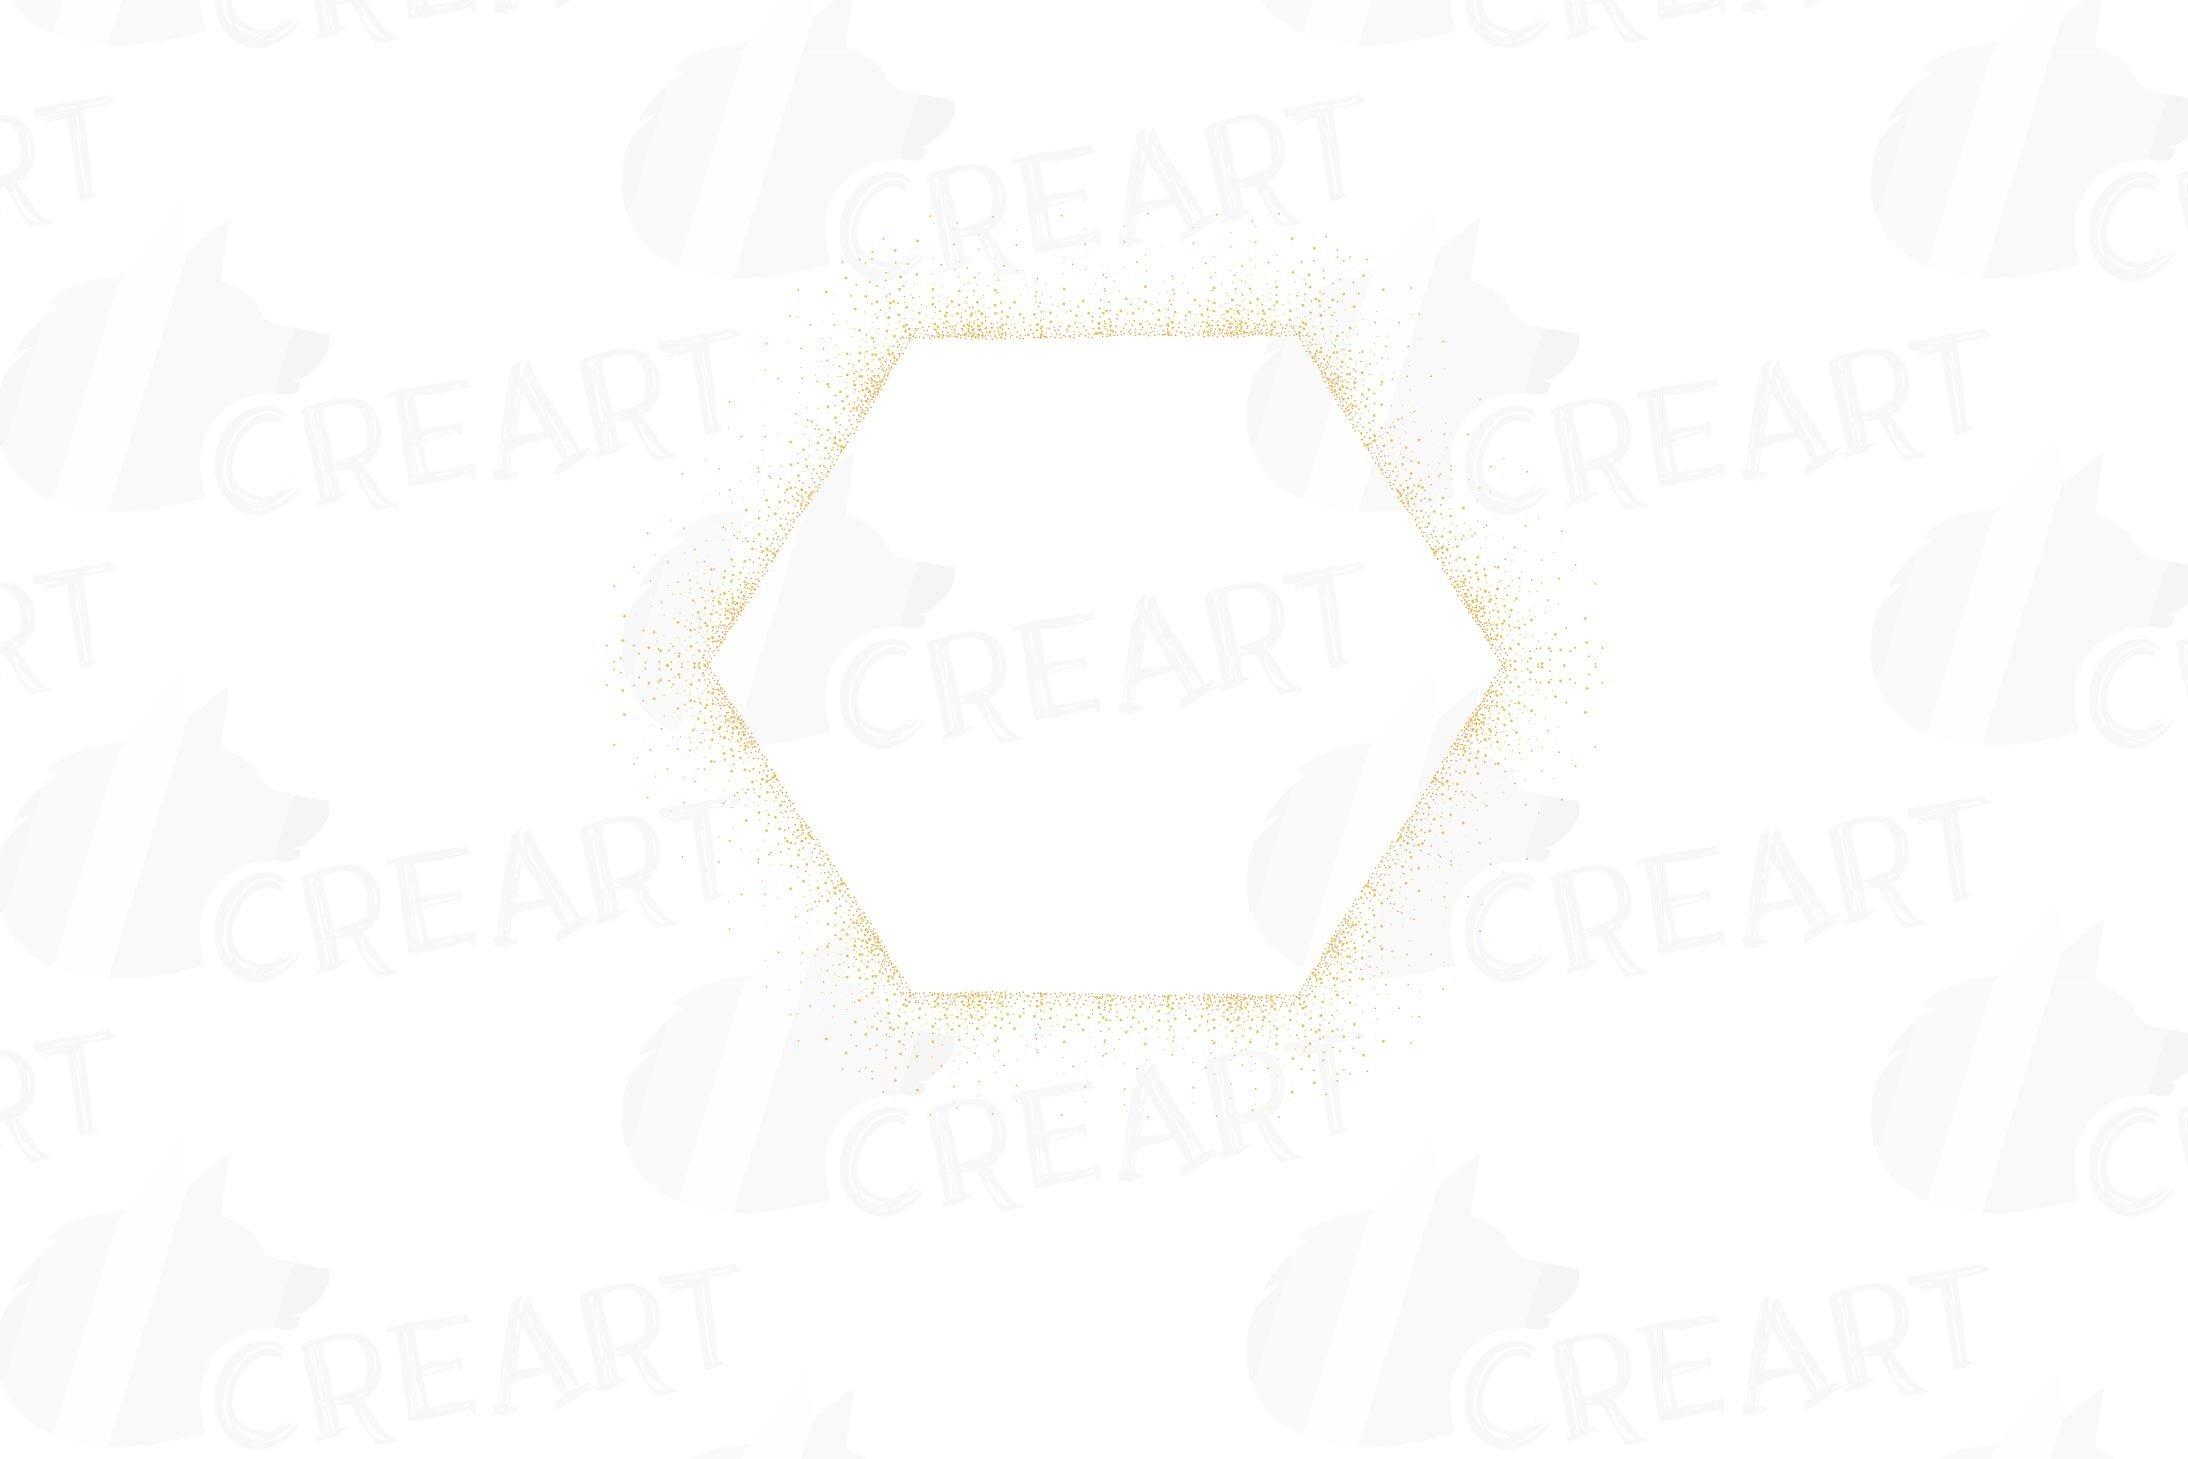 Download Glitter And Sparkling Golden Geometric Frames And Borders 294568 Illustrations Design Bundles